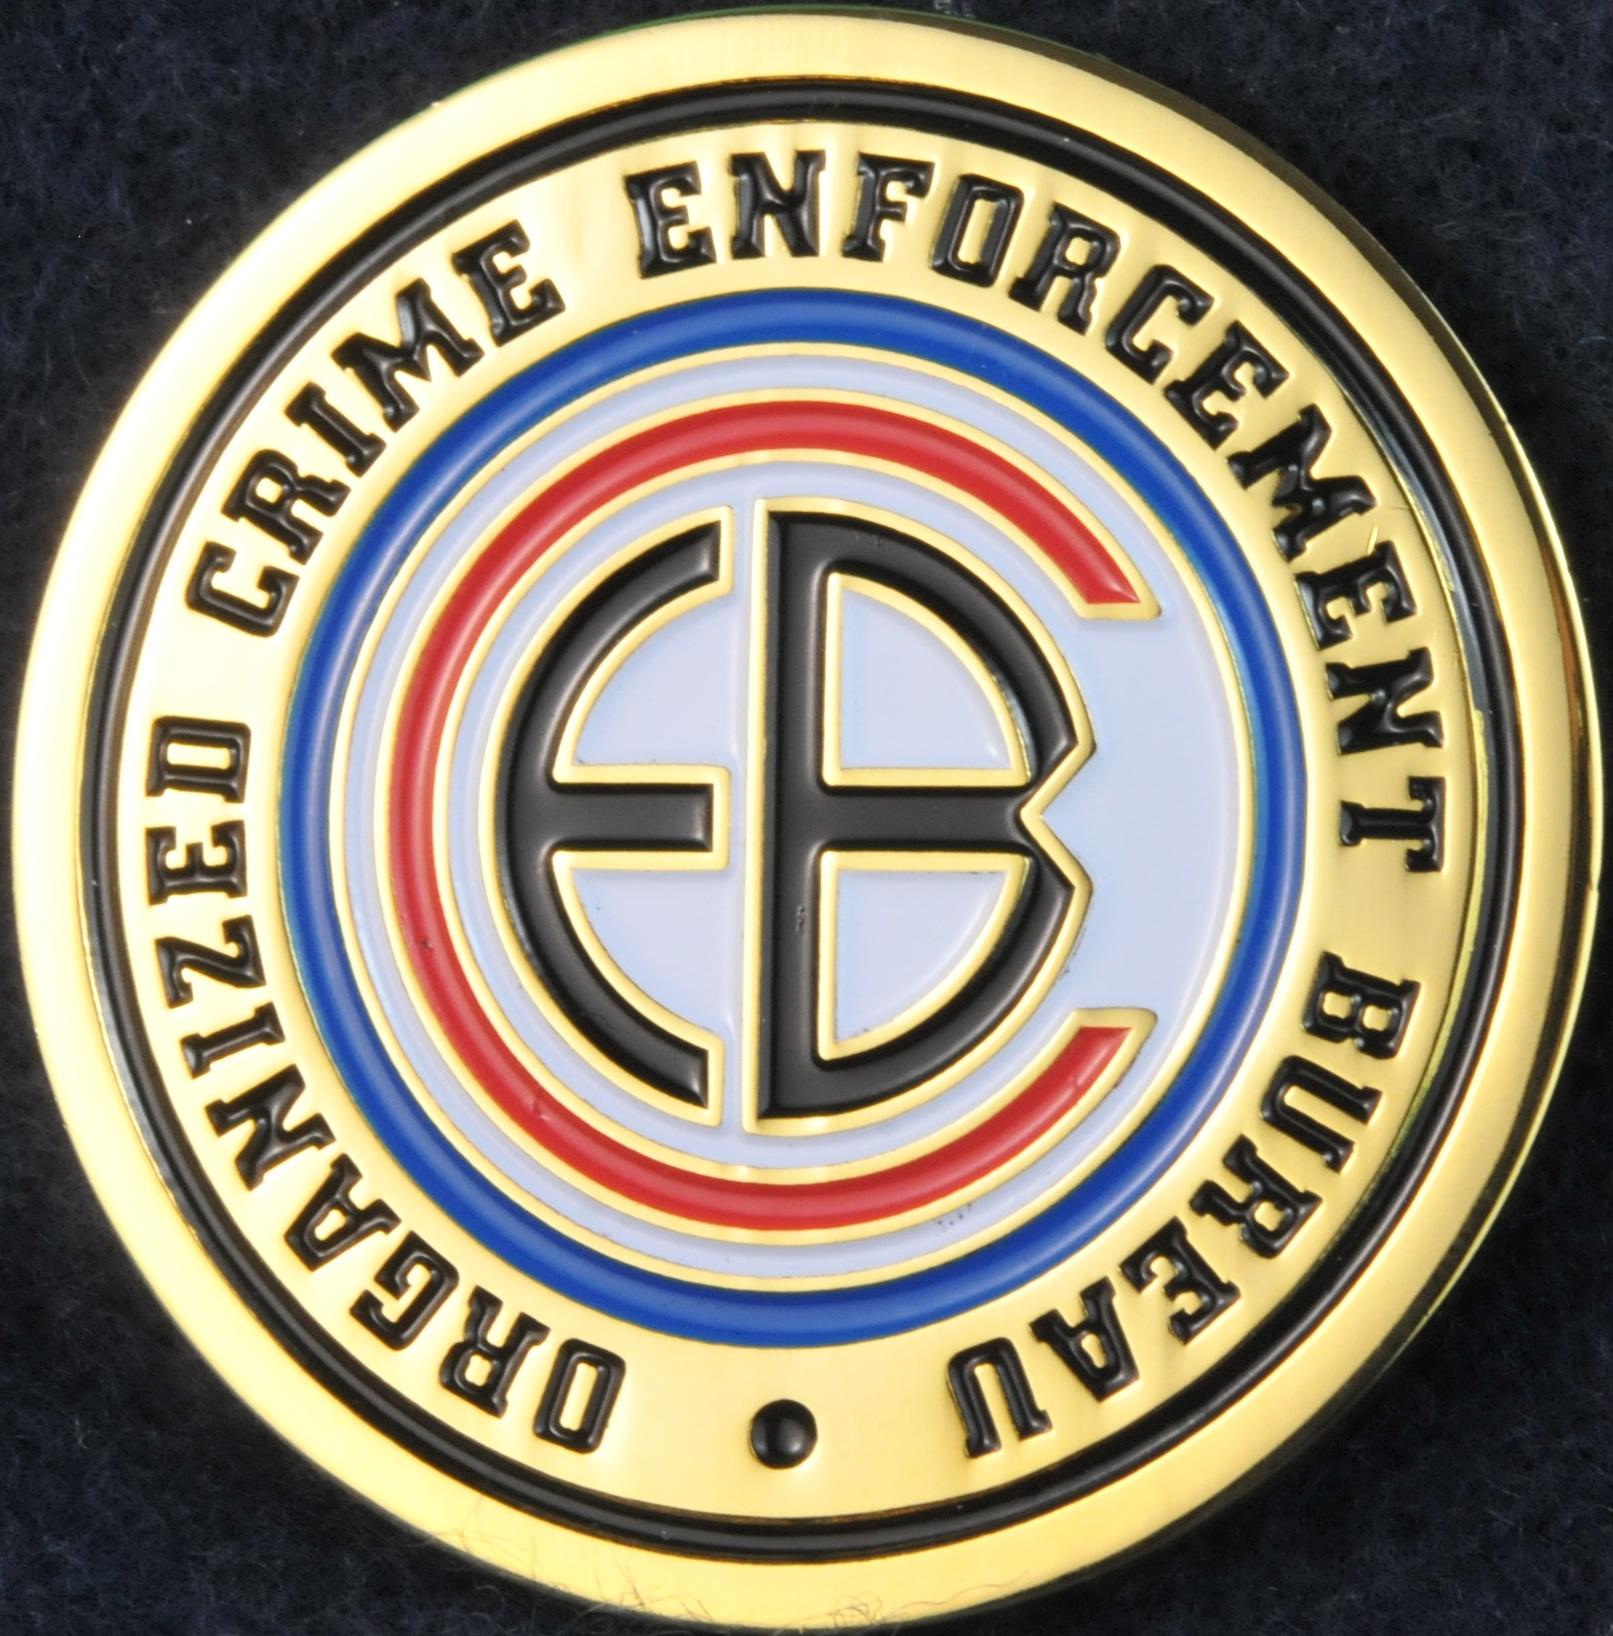 ontario organized crime enforcement bureau. Black Bedroom Furniture Sets. Home Design Ideas